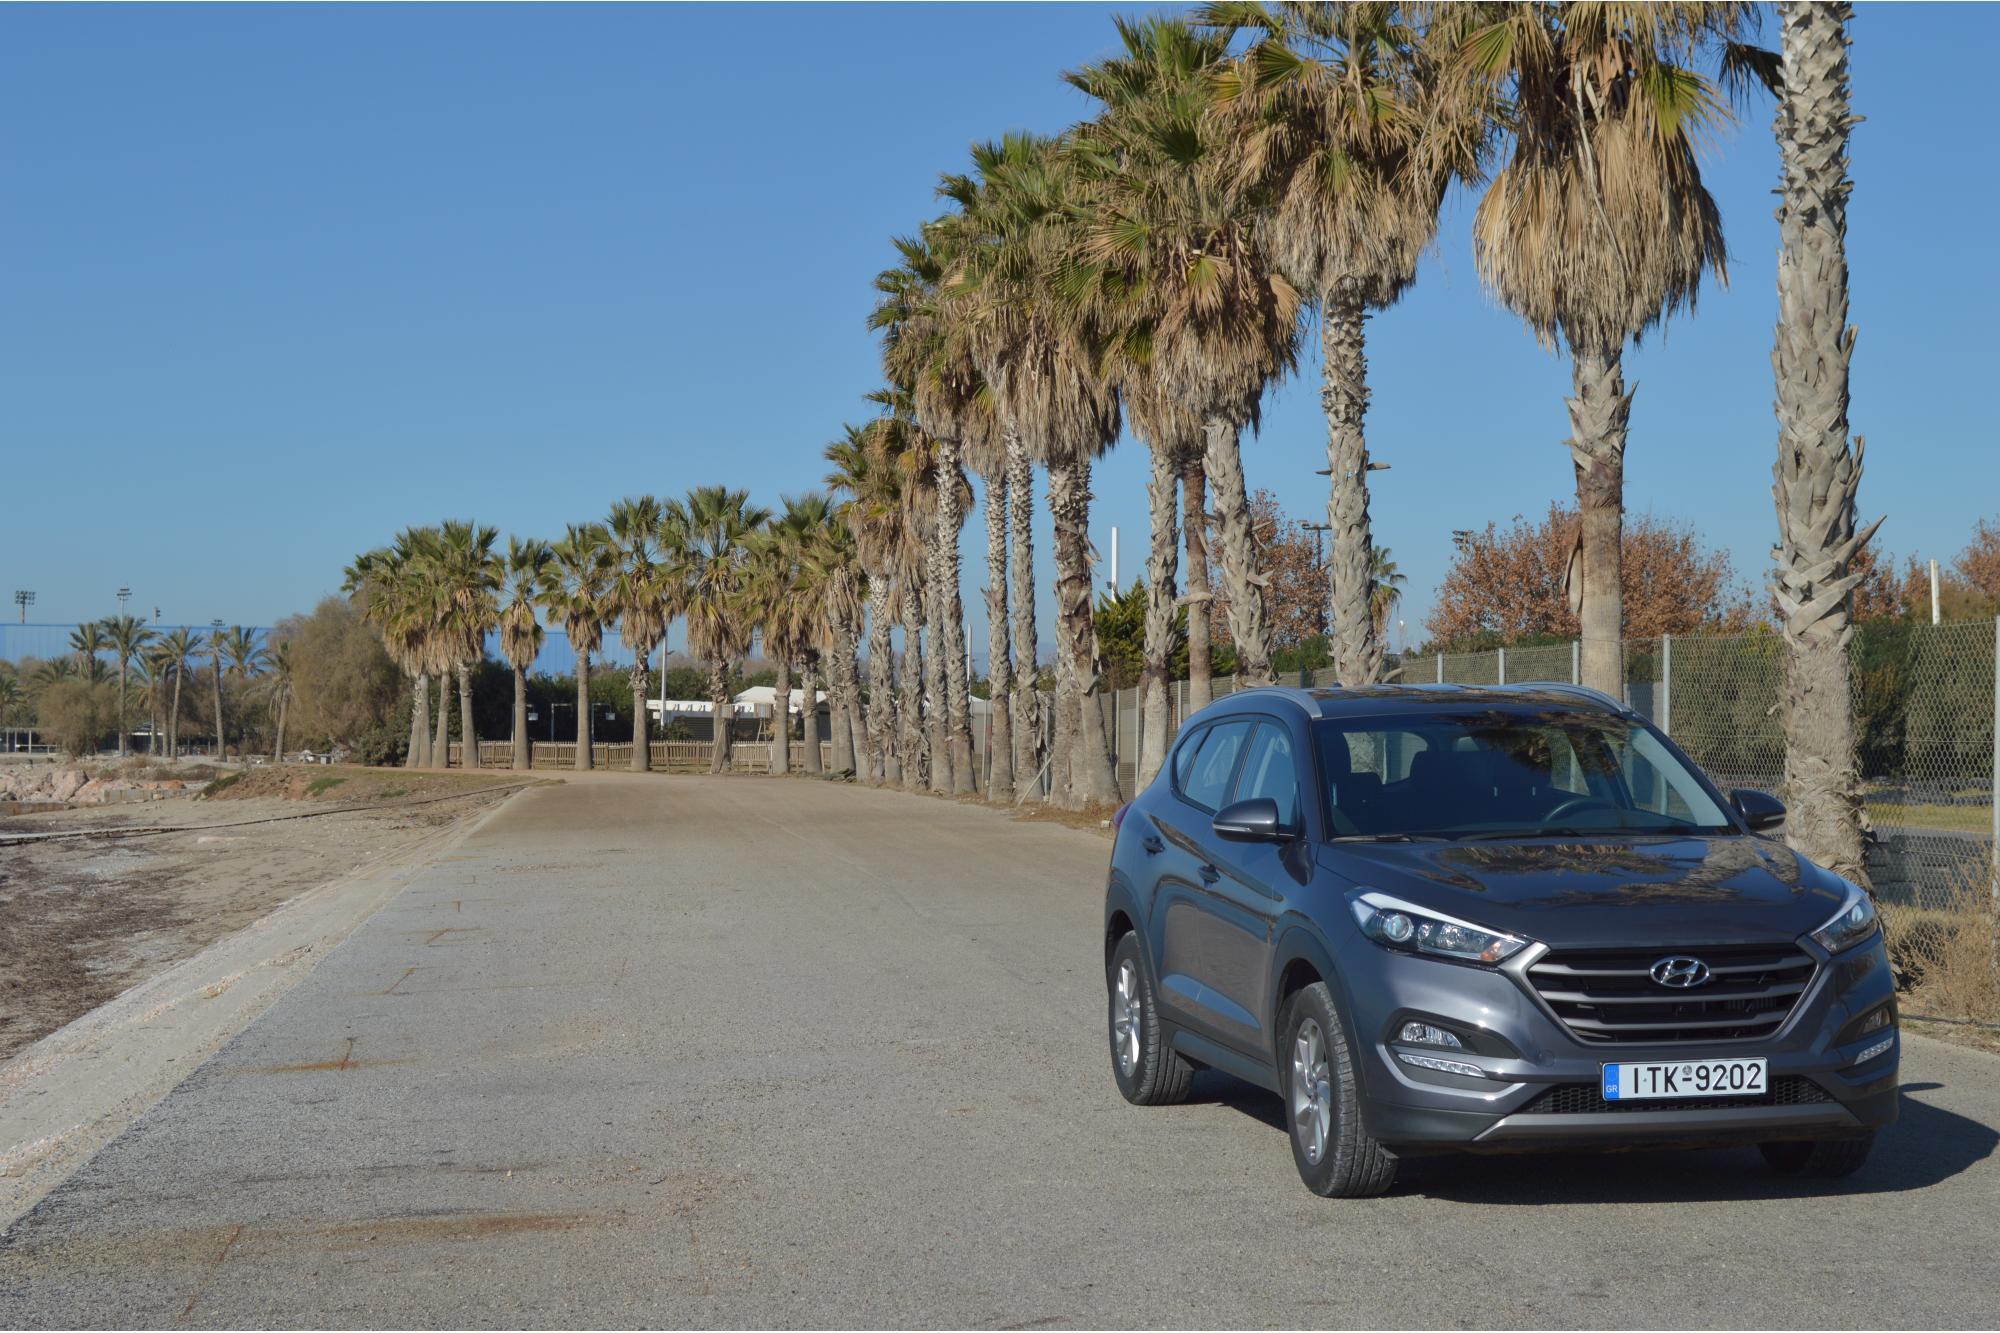 Hyundai Tucson 1.7 CRDi 141Ps 7-DCT